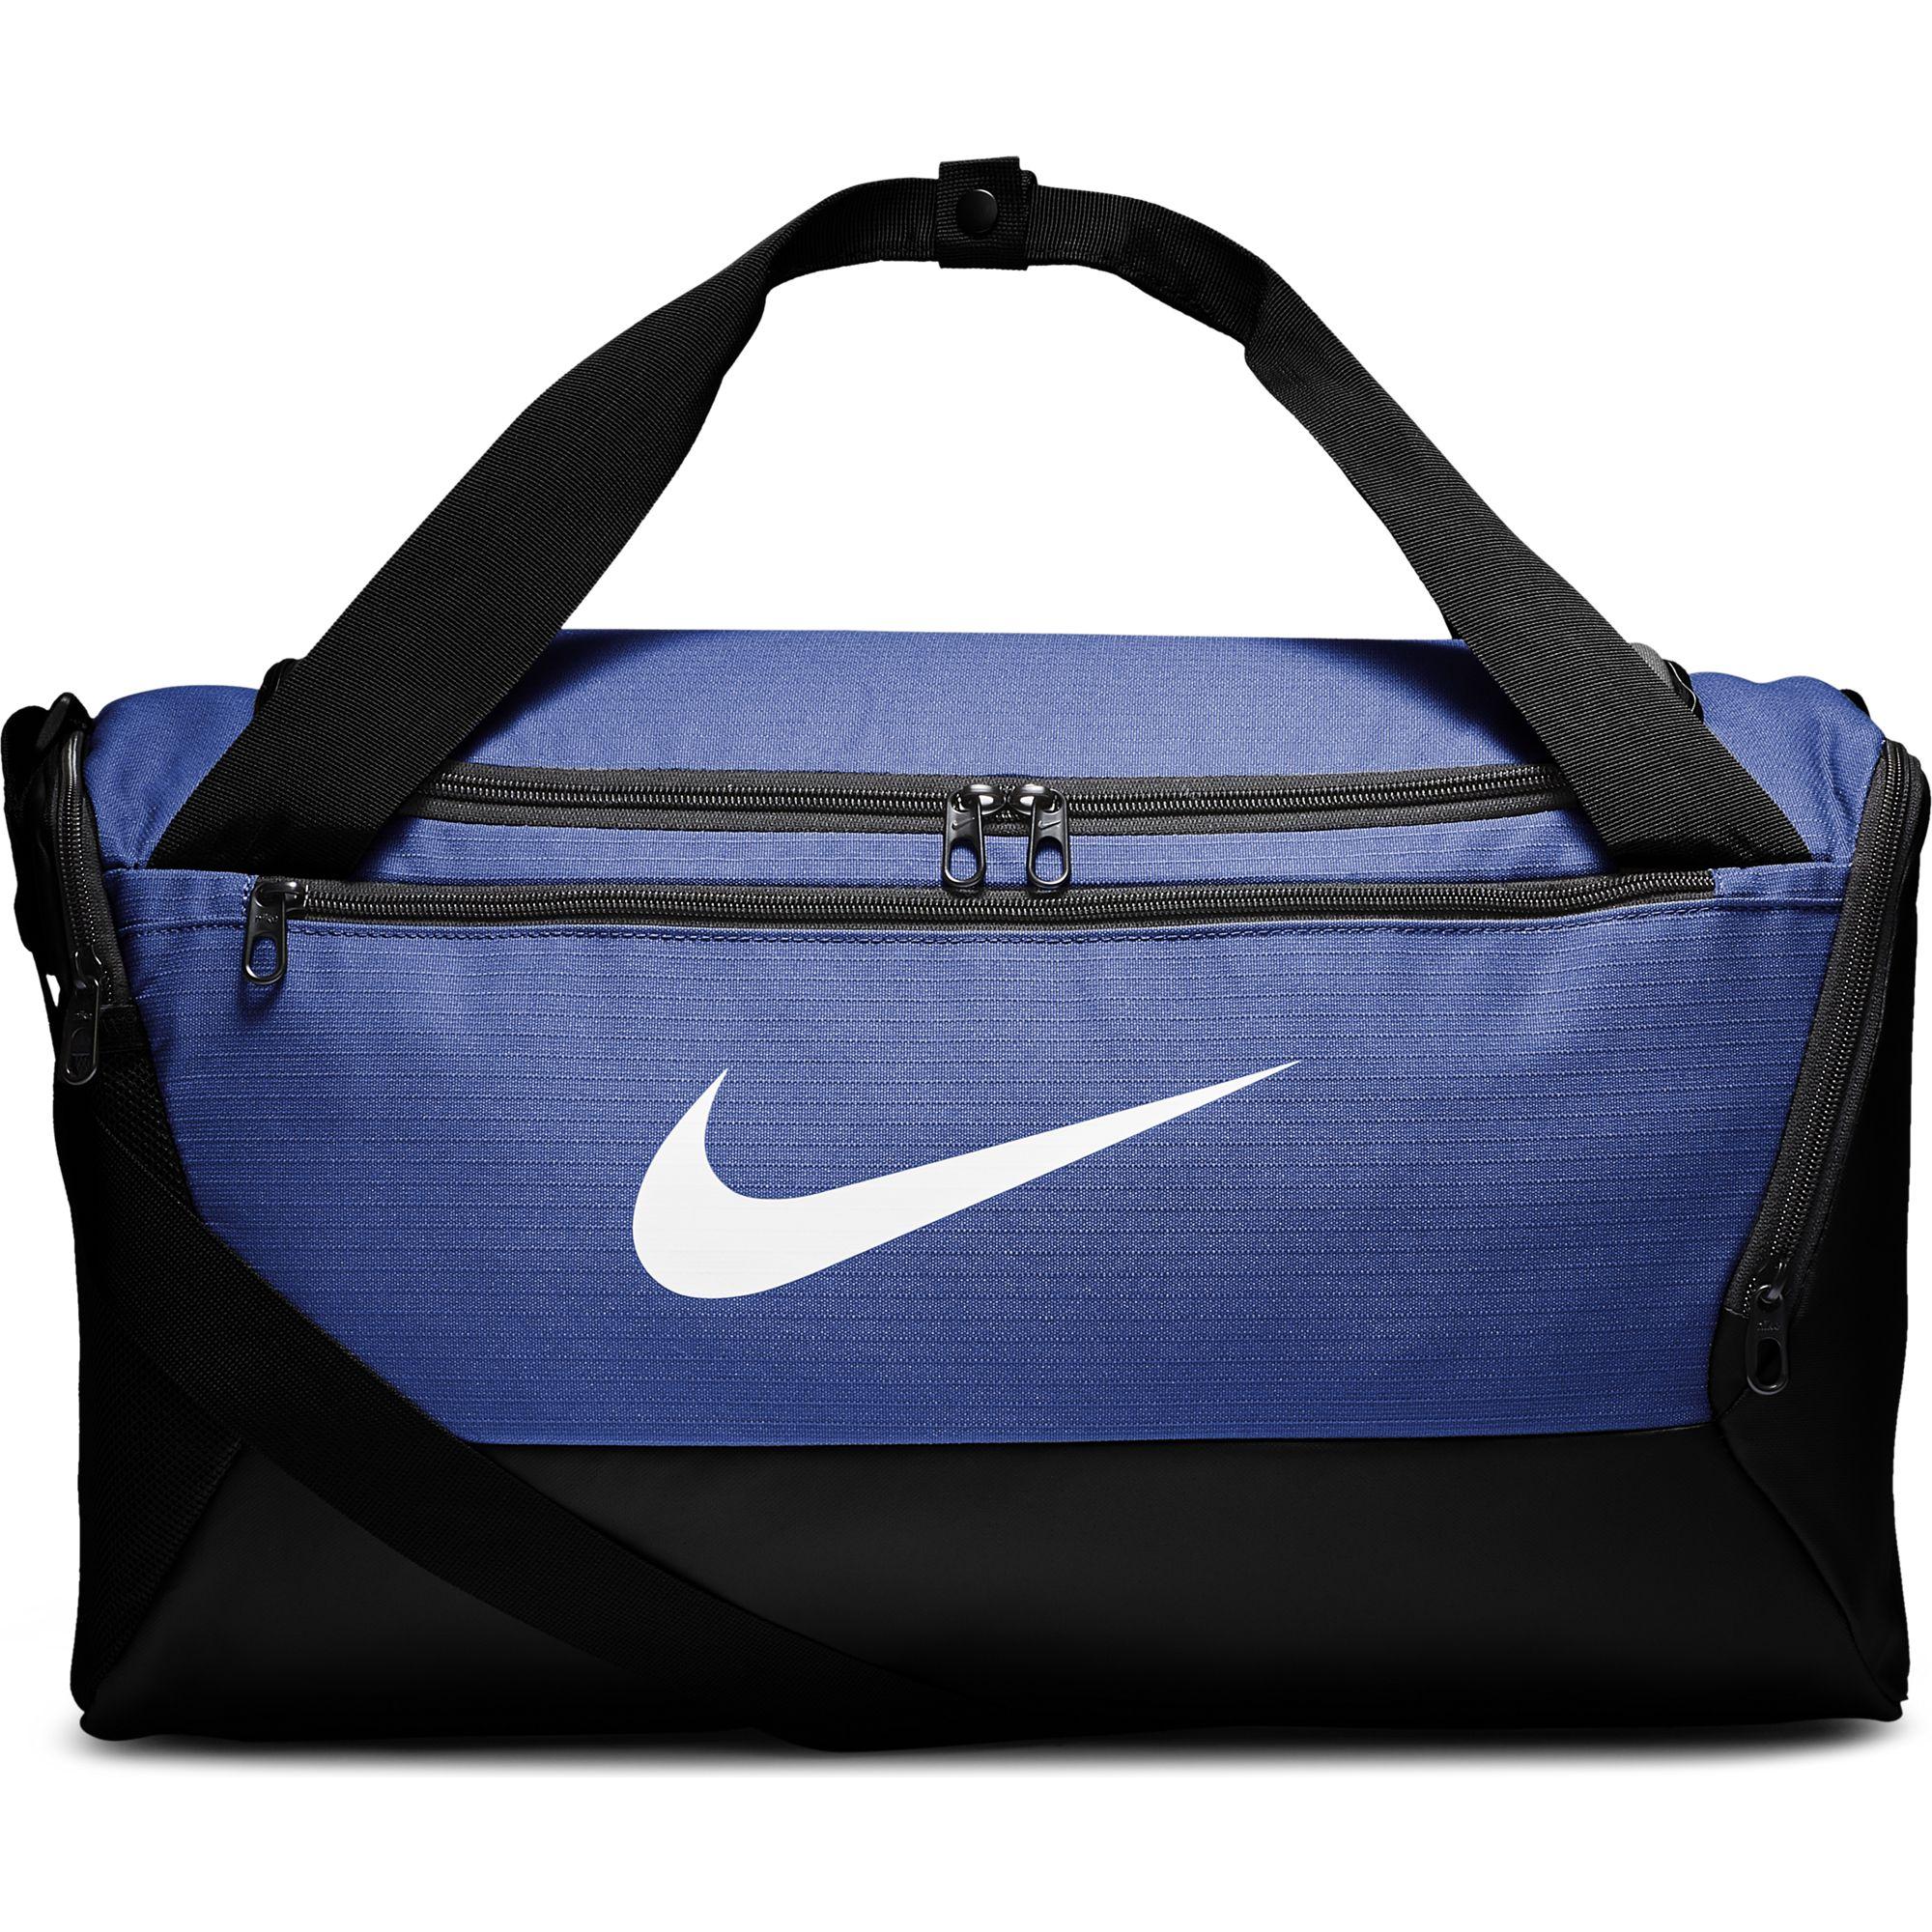 Brasilia Small Training Duffell Bag, Royal Bl,Sapphire,Marine, swatch